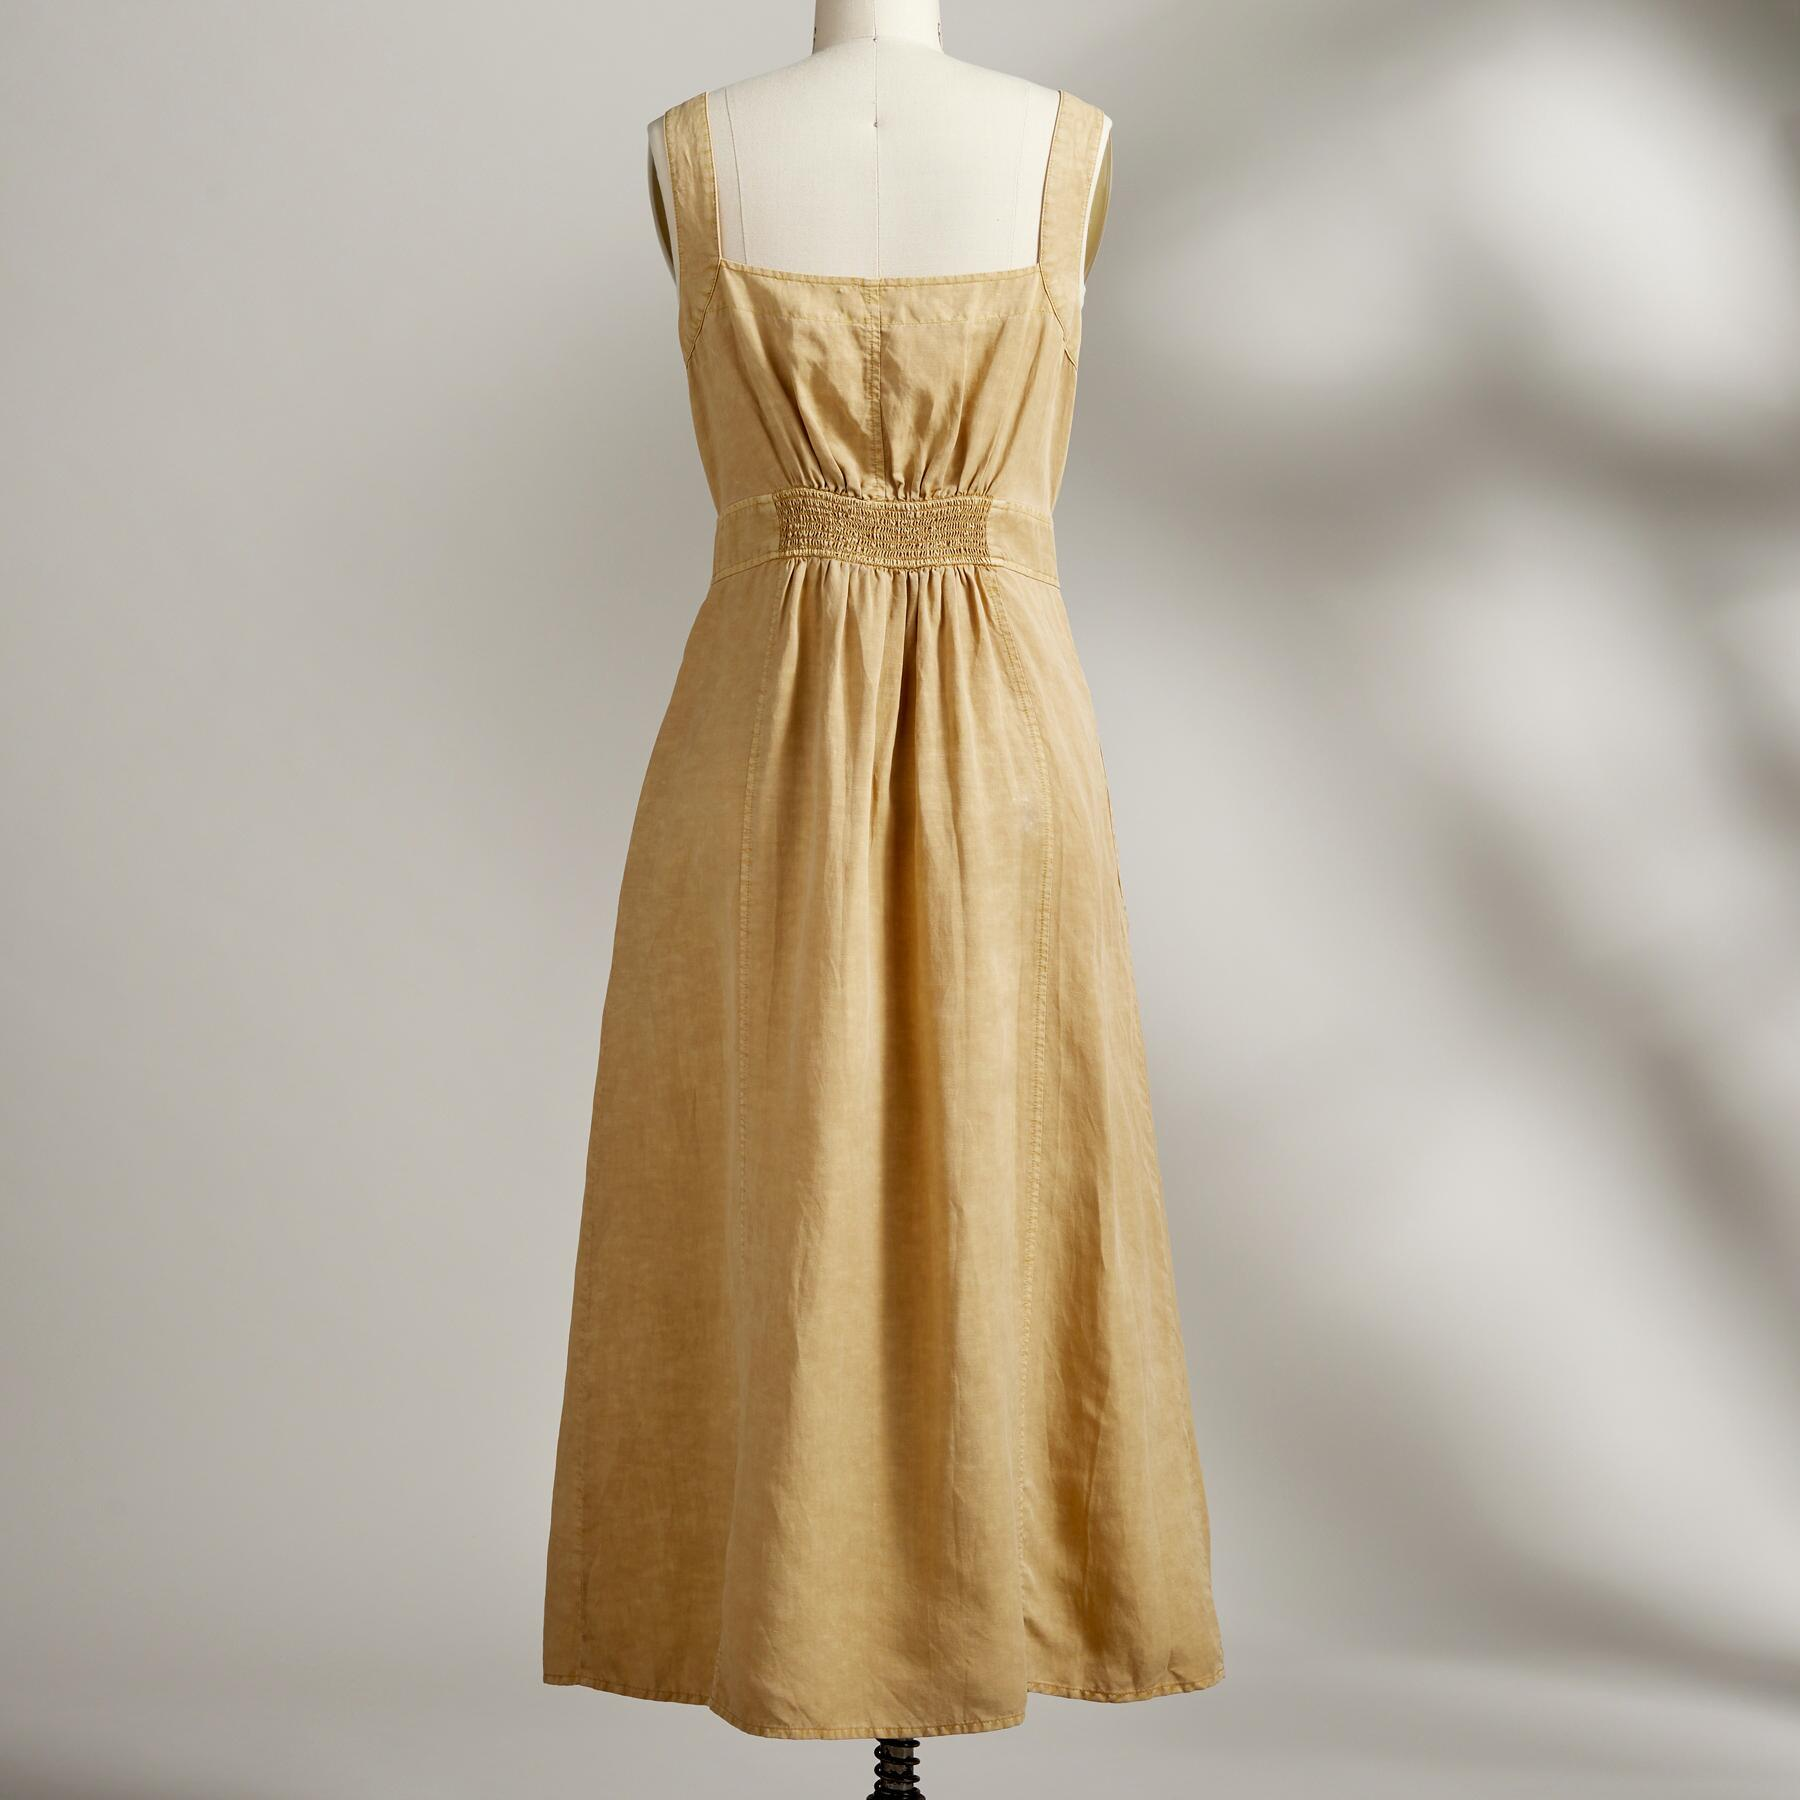 COLONIAL DRESS PETITE: View 3